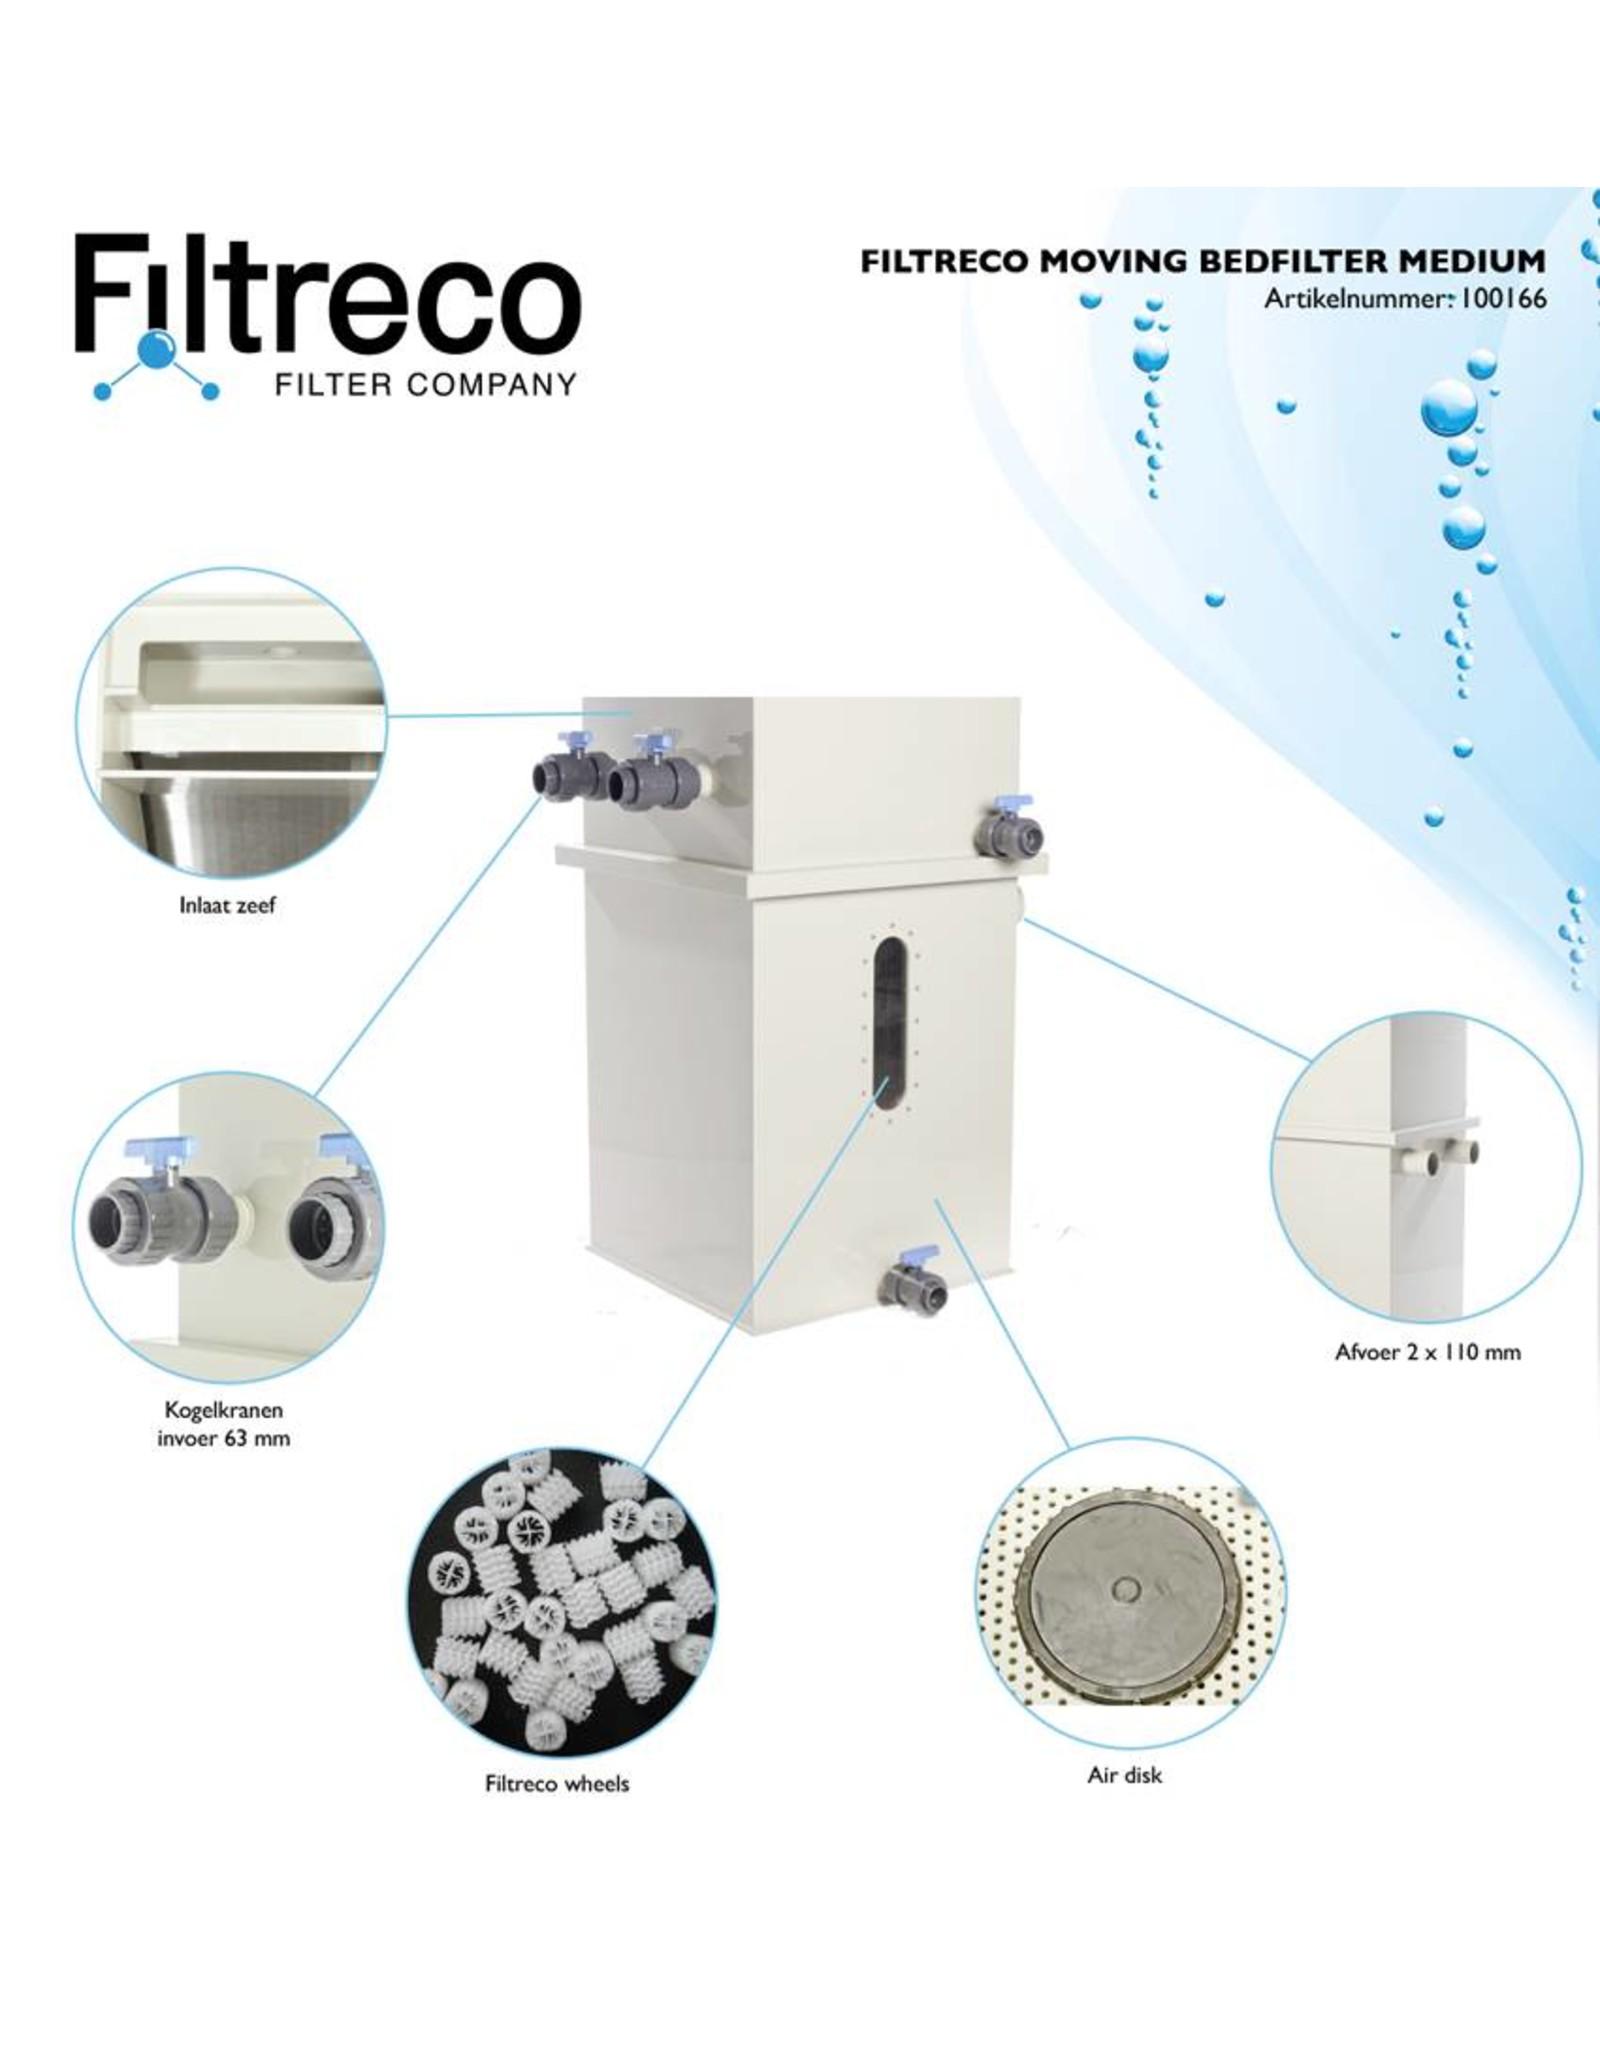 Filtreco Filtreco Moving Bed Filter Medium